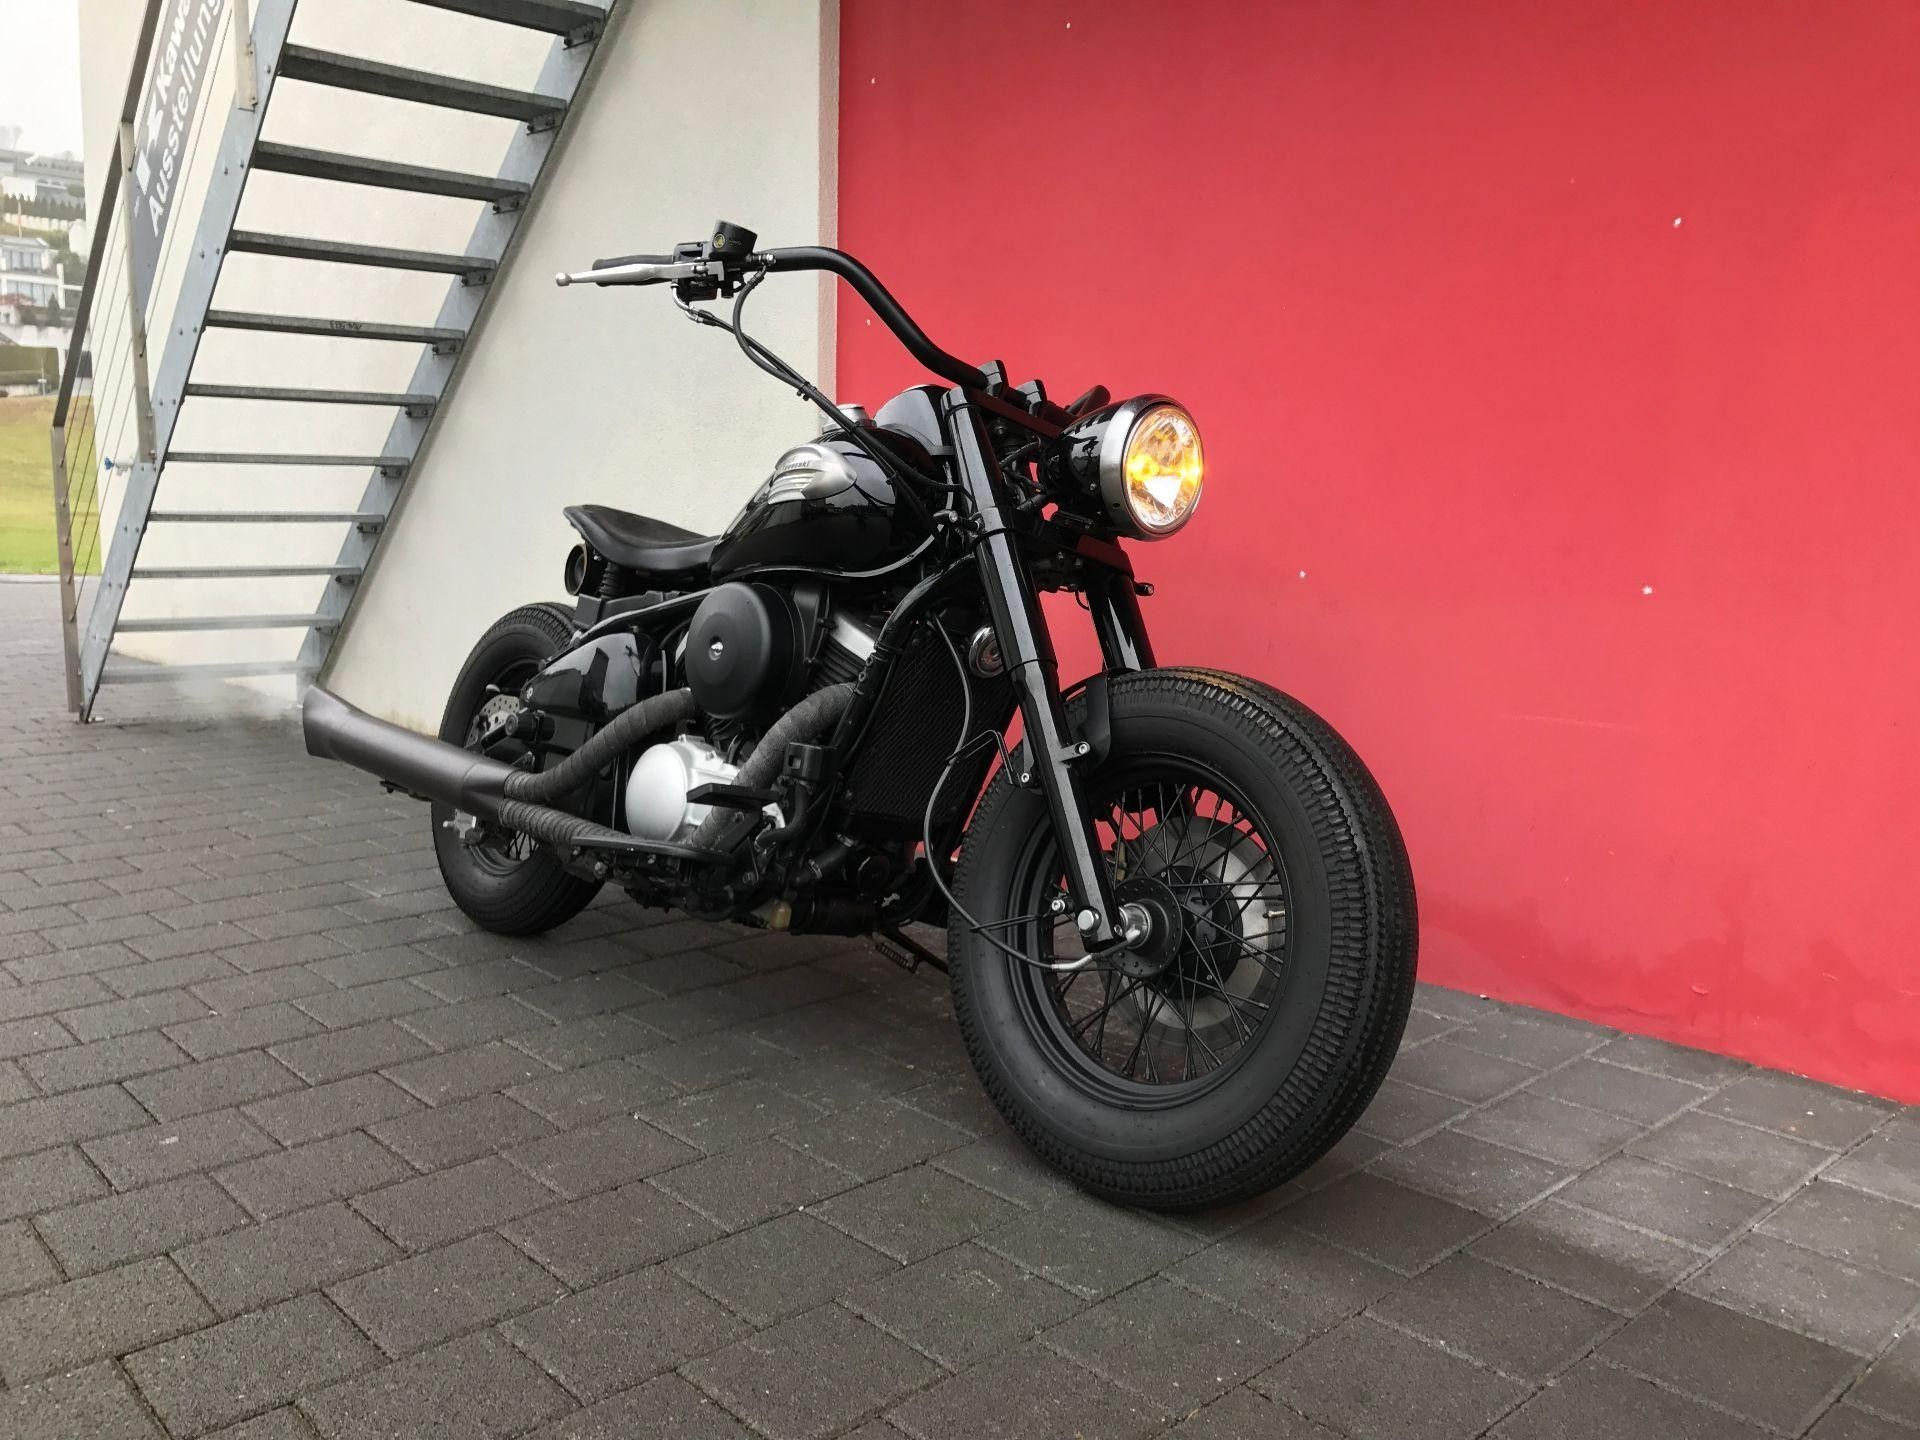 kawasaki vn 1500 drifter kaufen motorrad bild idee. Black Bedroom Furniture Sets. Home Design Ideas